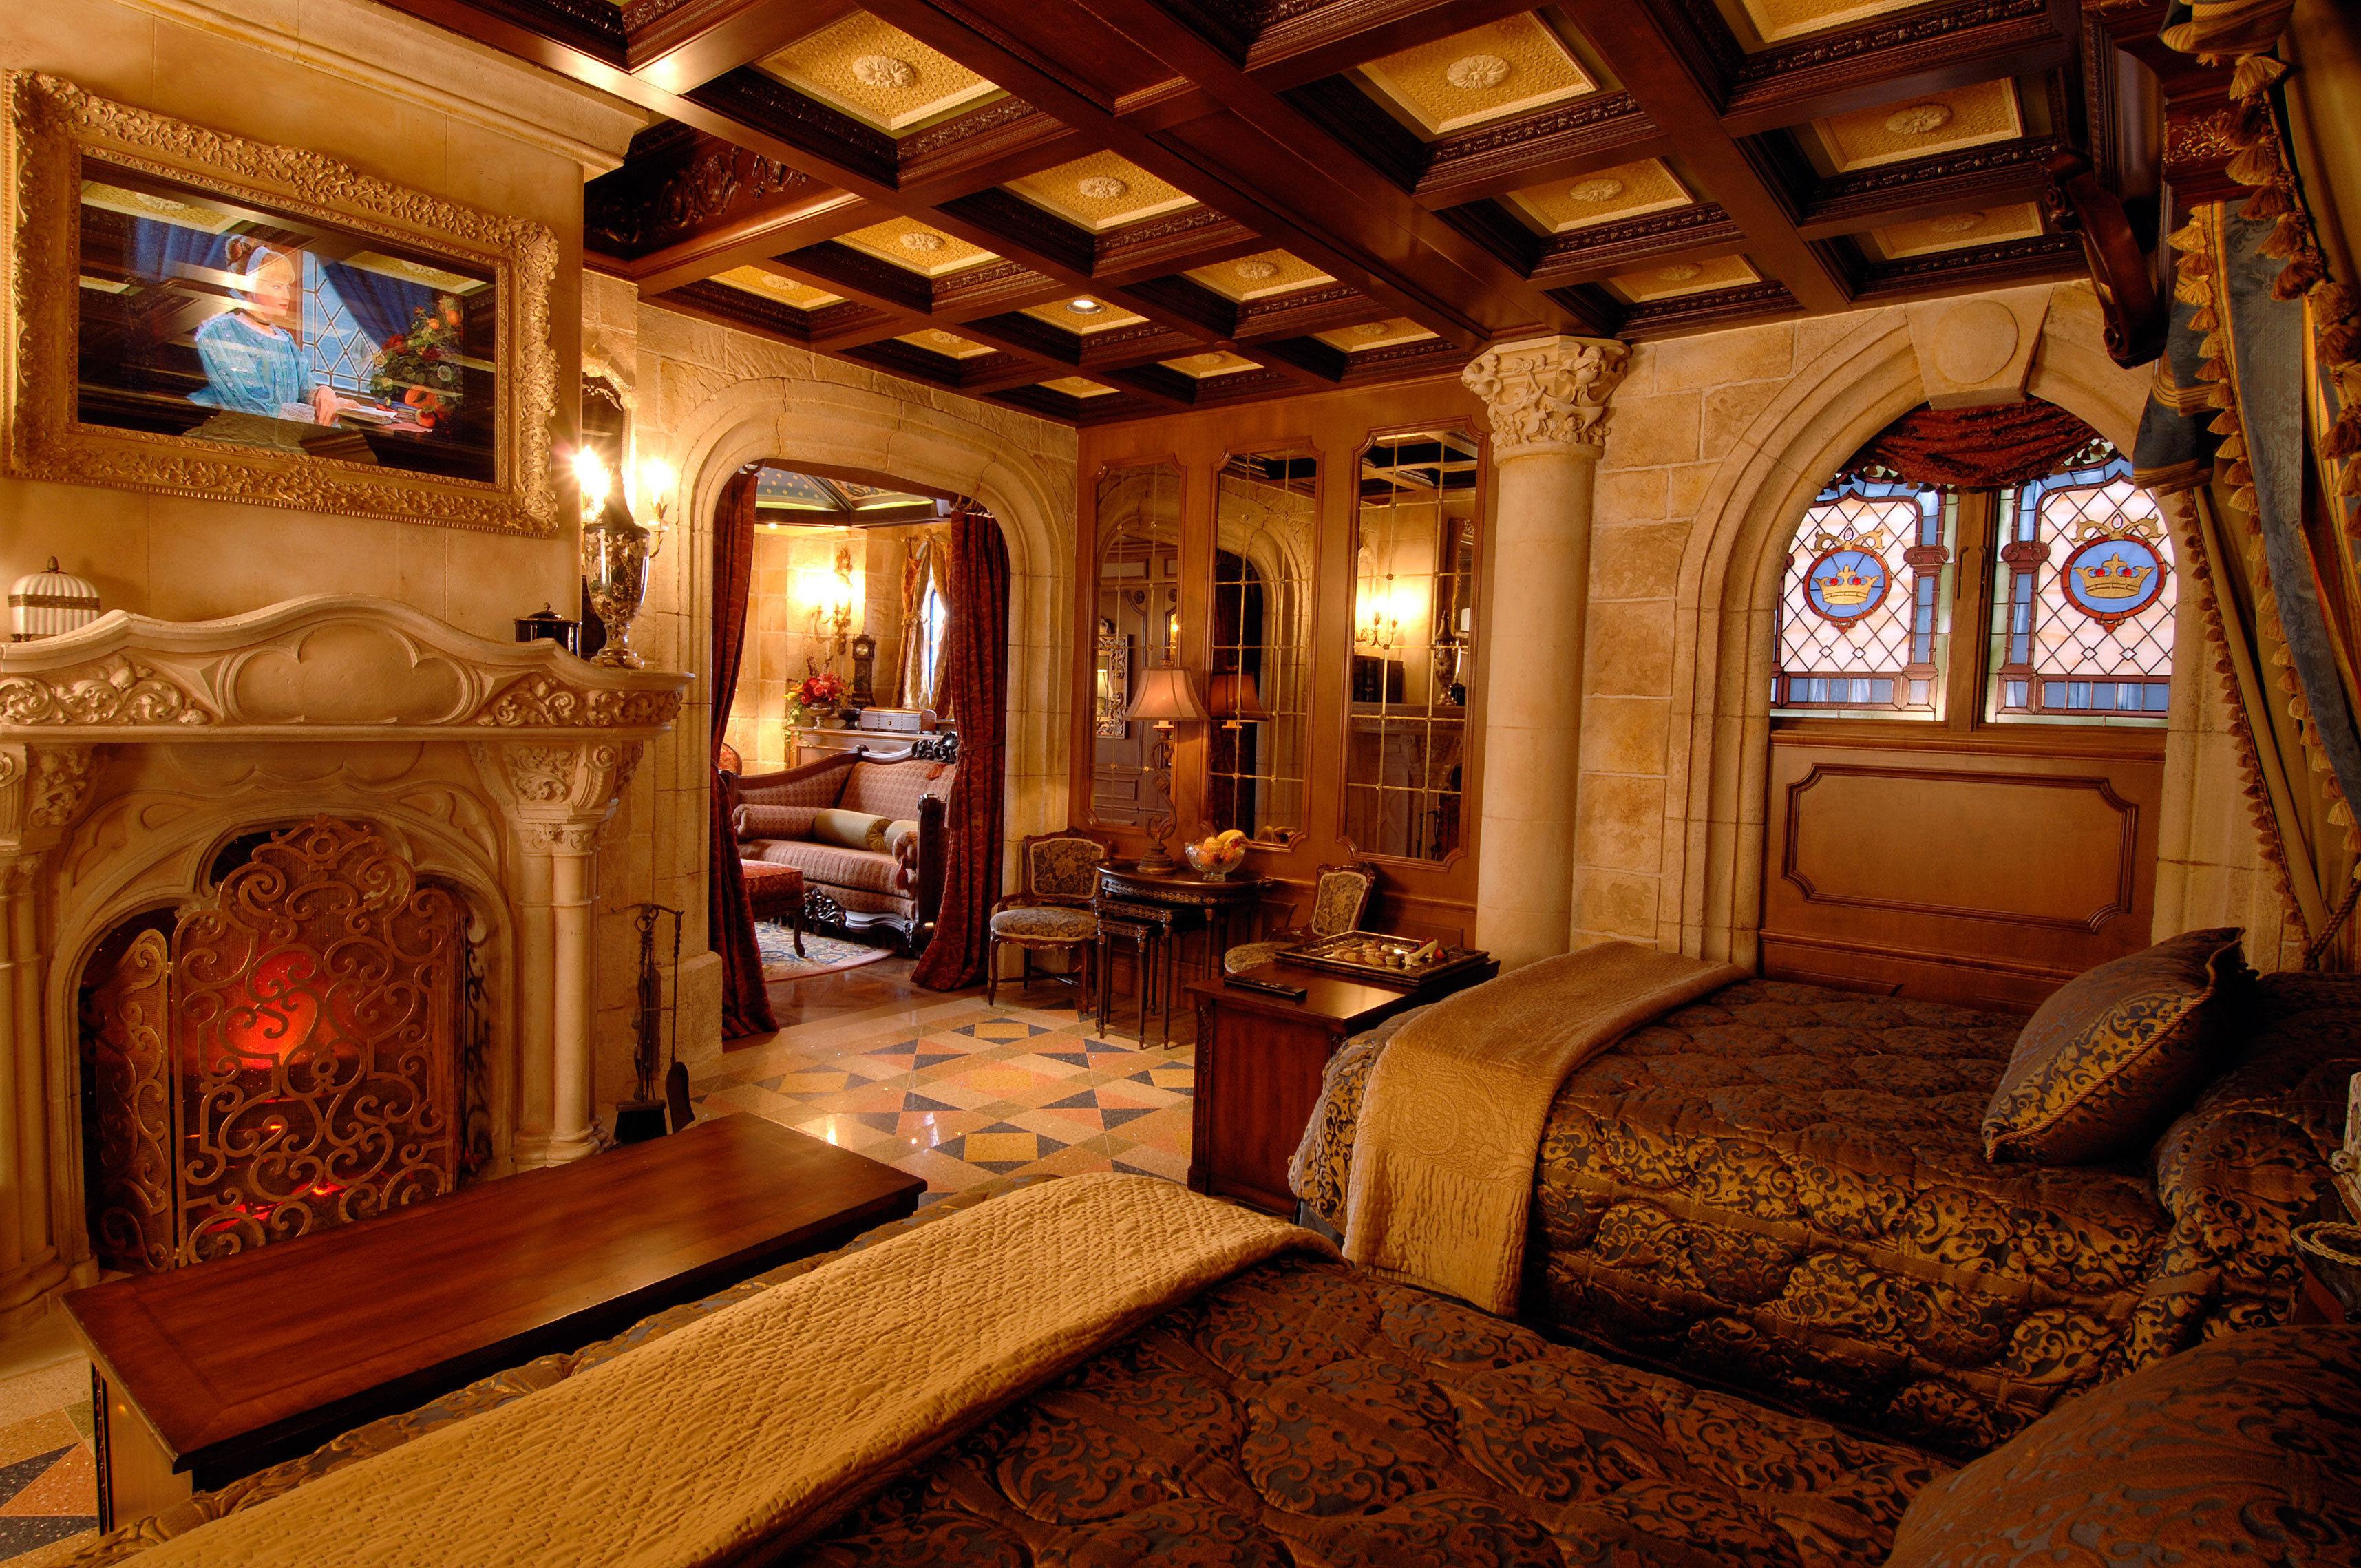 03-tour-suite-secreta-cinderela-castelo-magic-kingdom-florida-disney